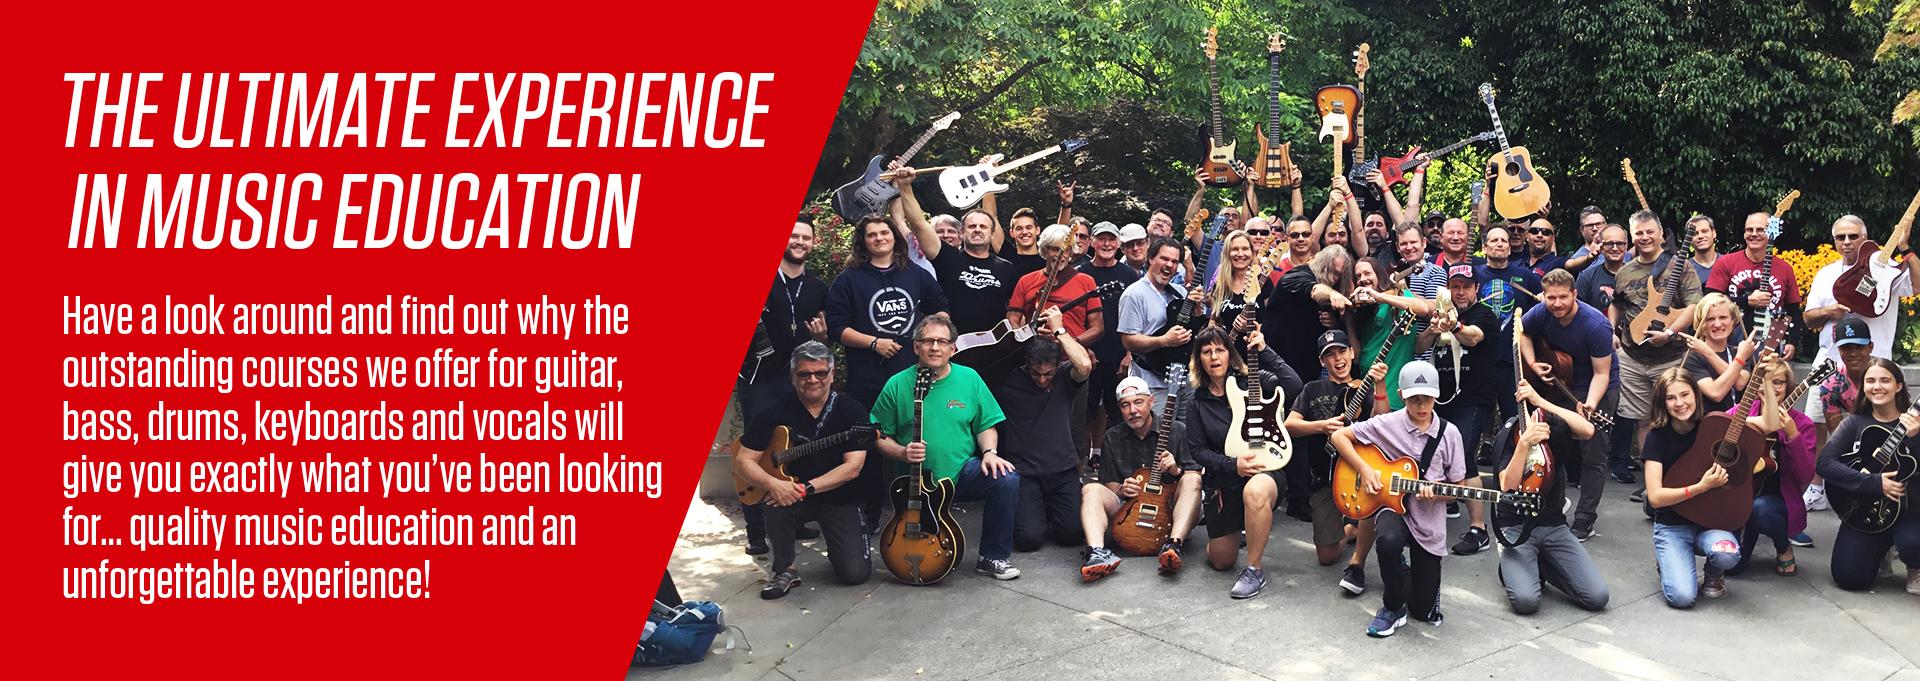 GWP-2019-MusicExperience-Slider-1